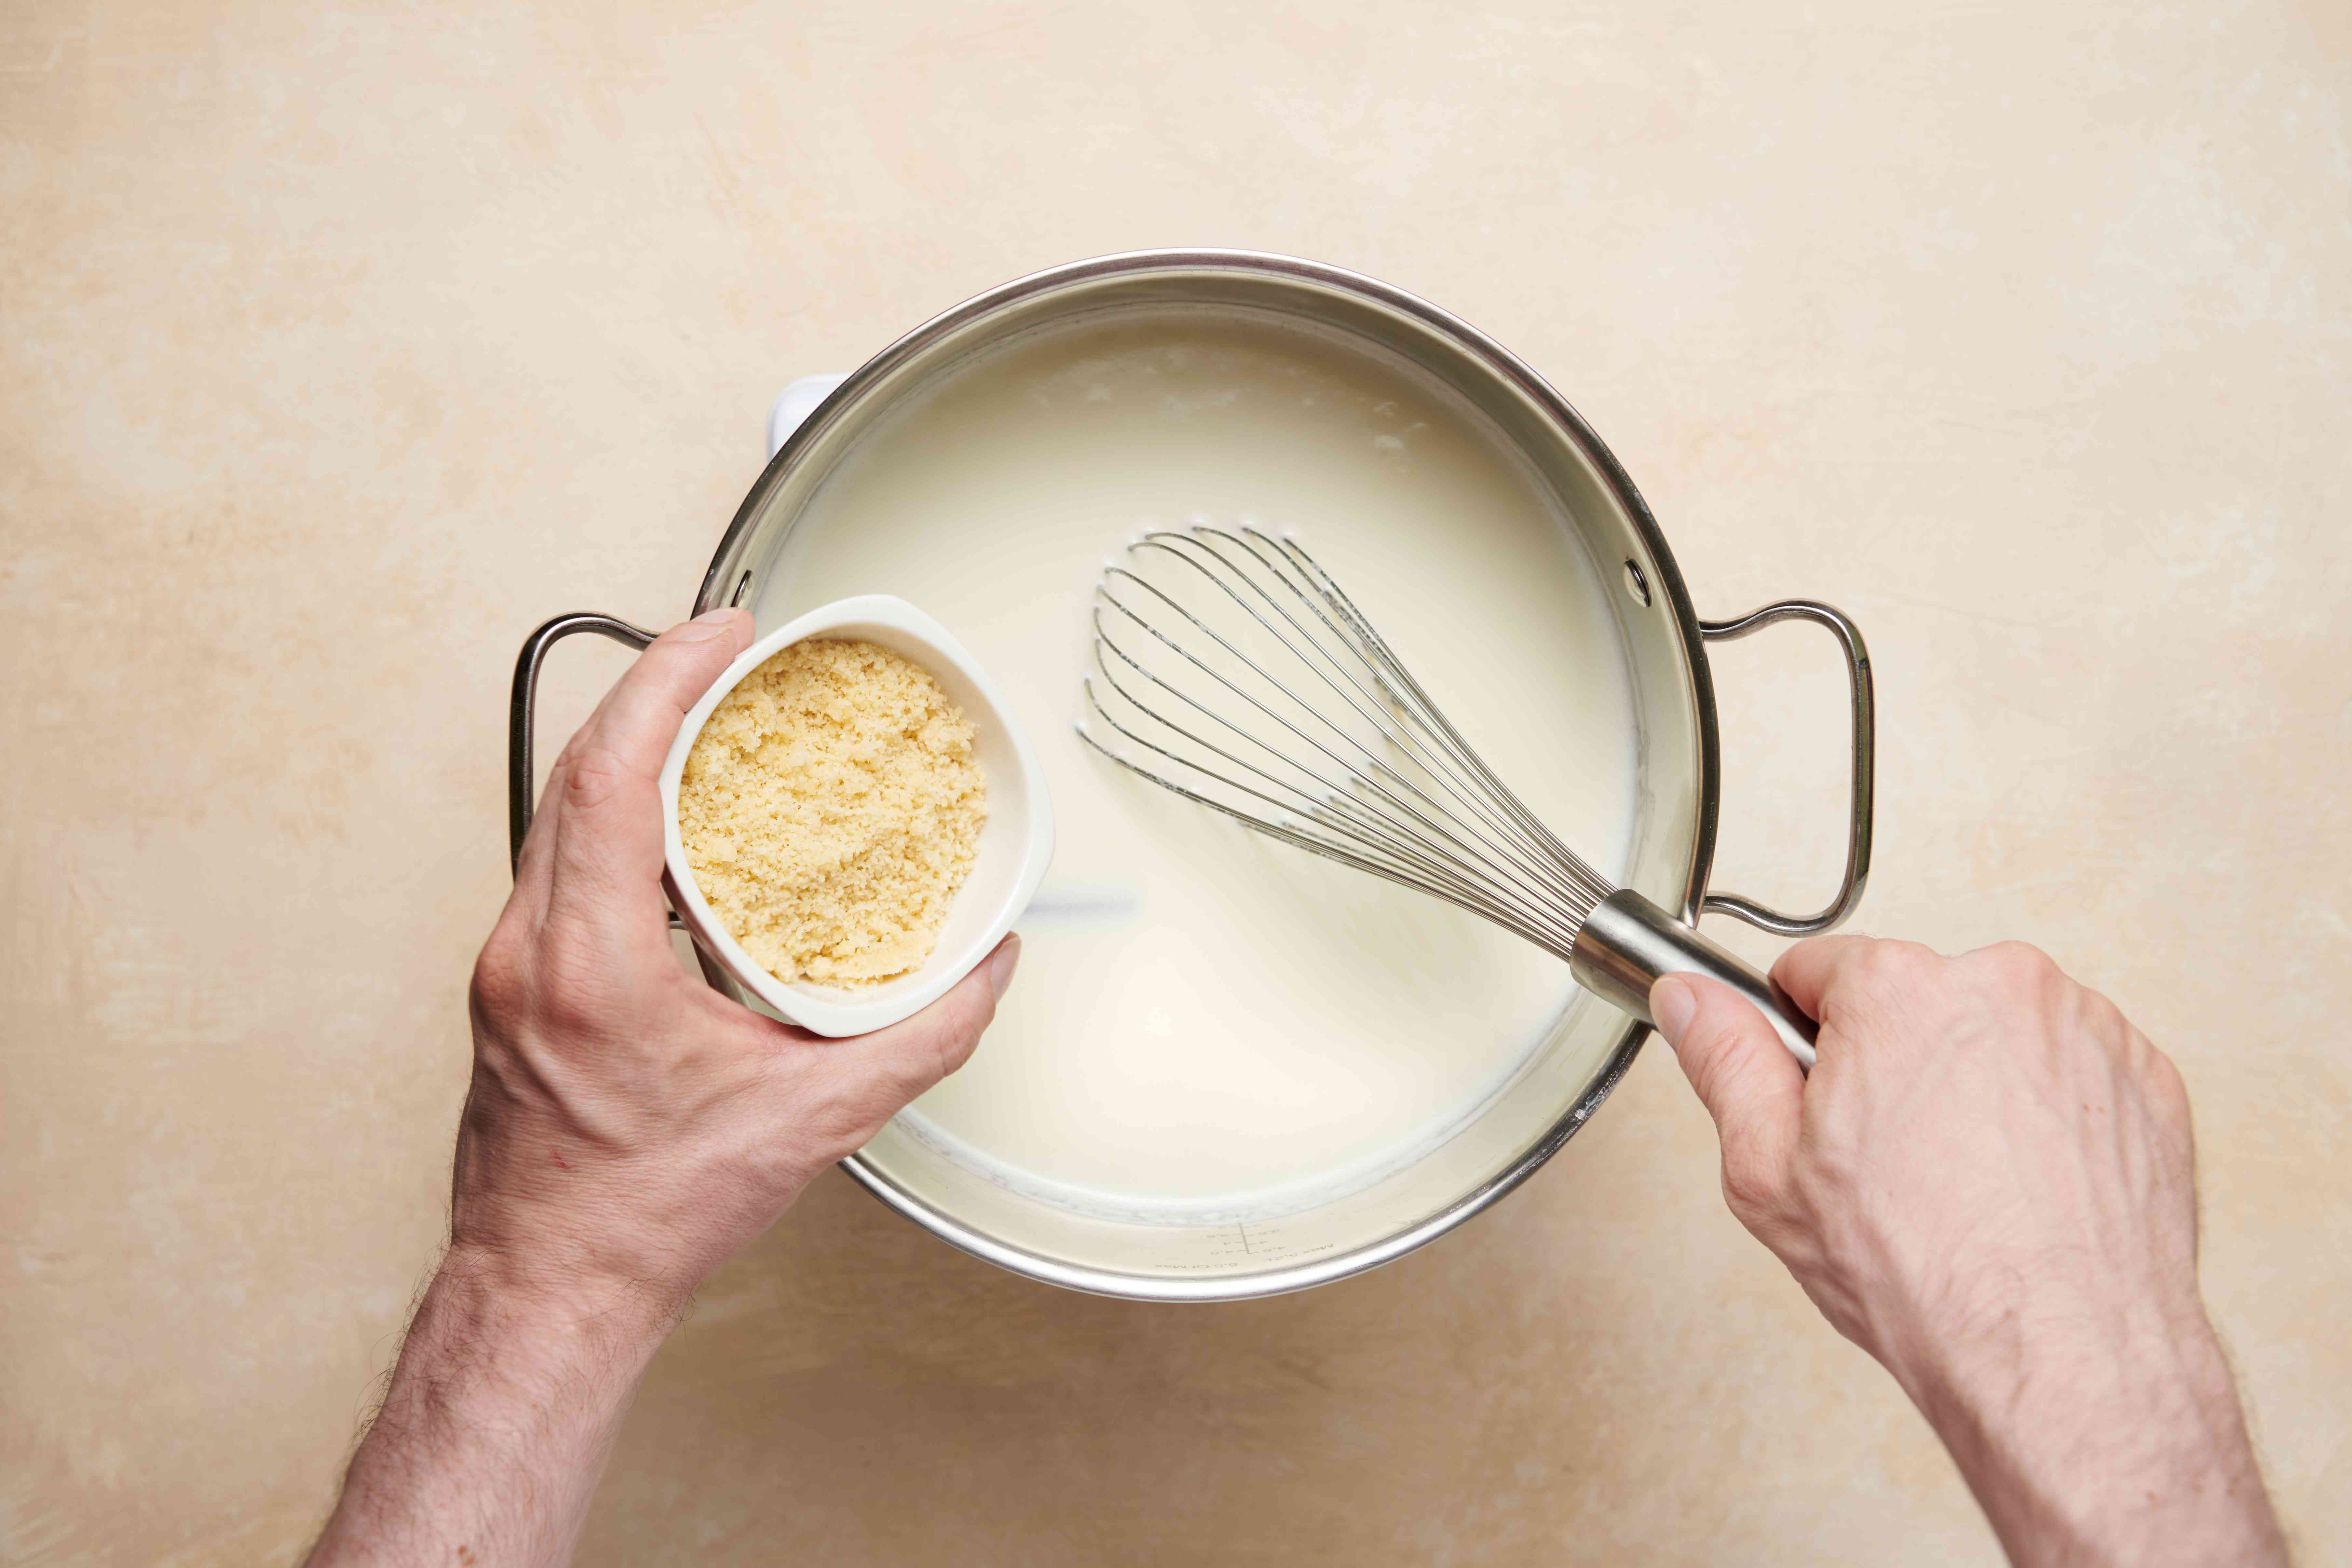 Whisk almond paste into milk mixture